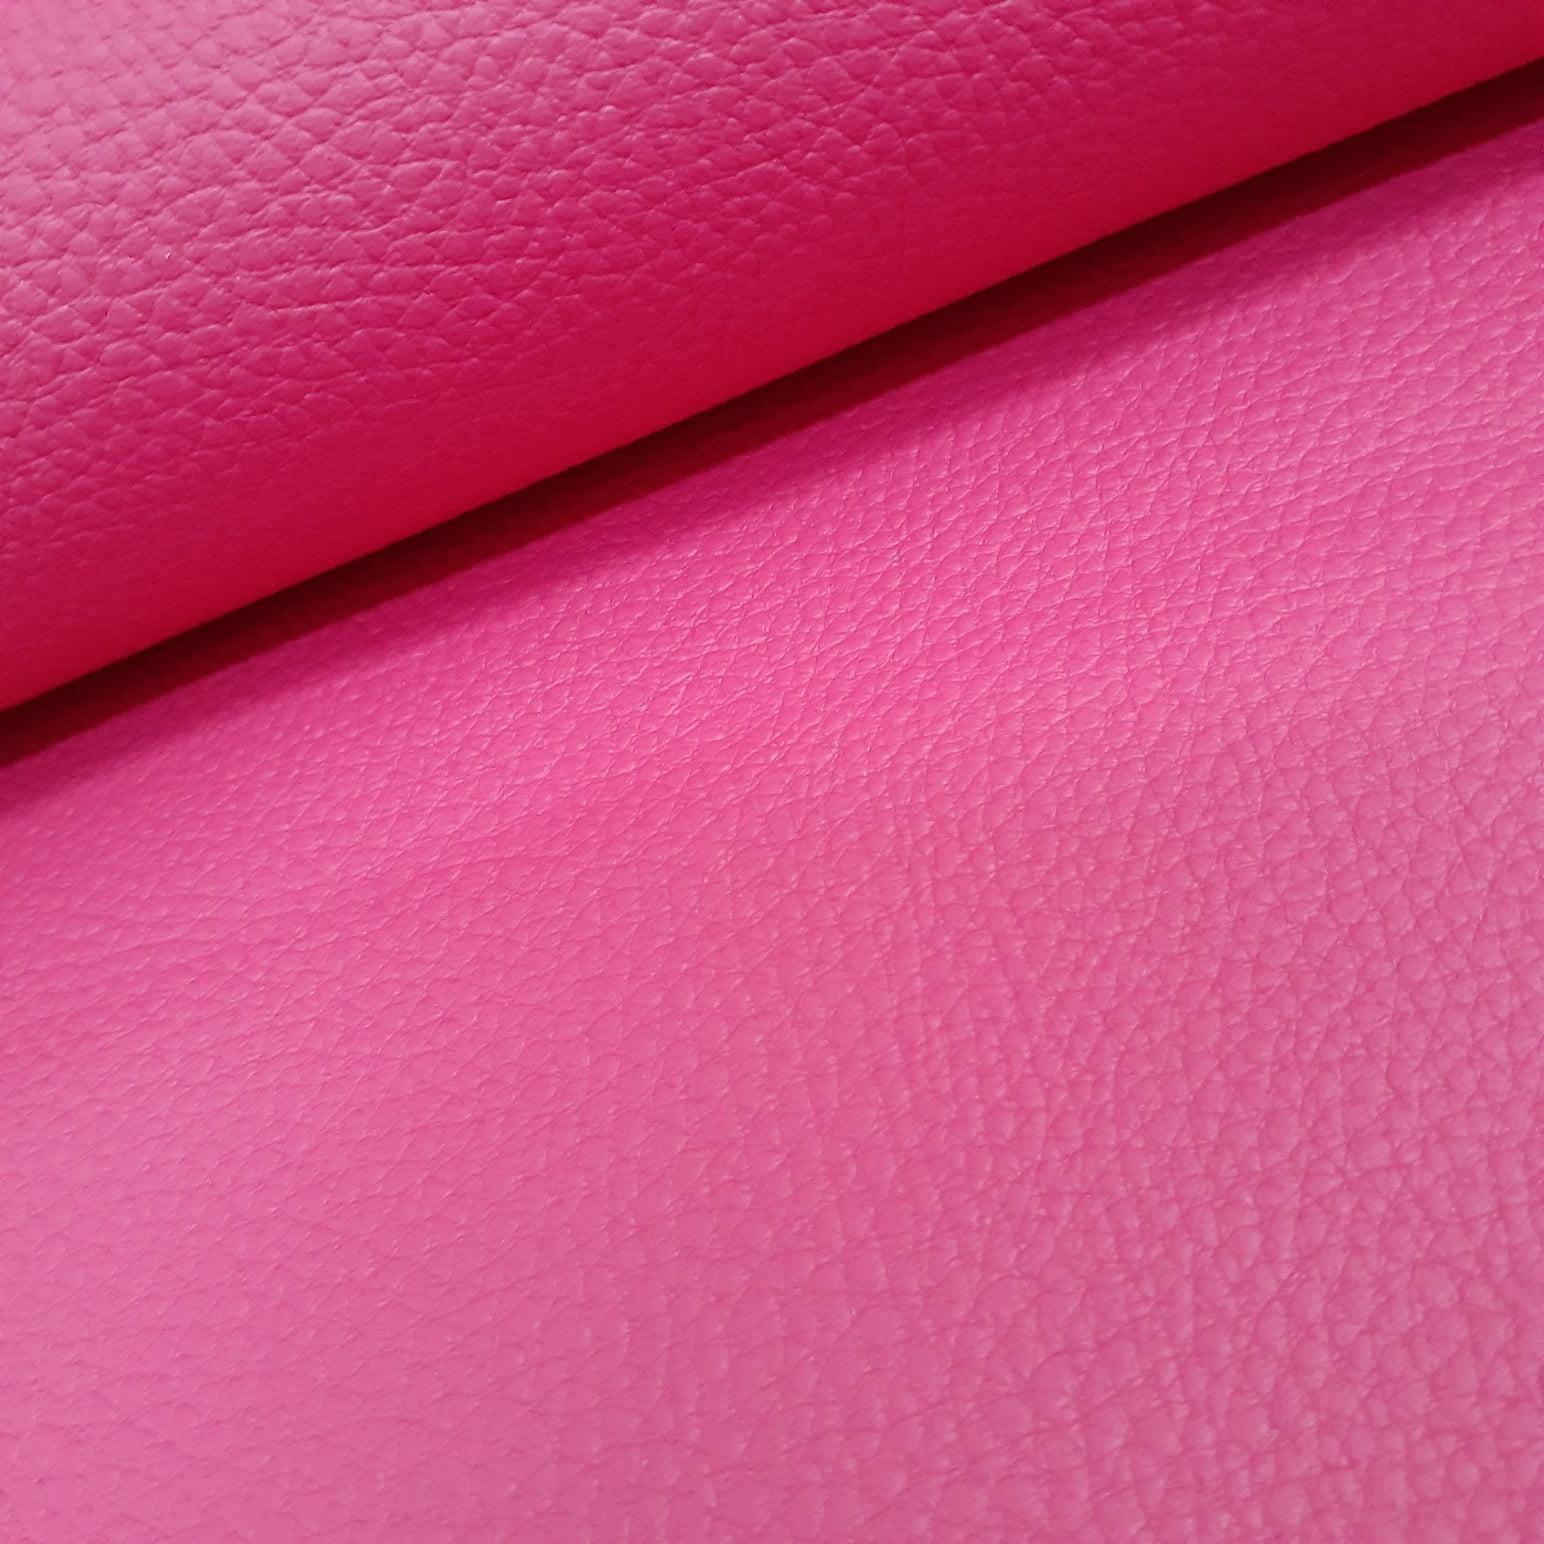 Courvin Kroyal Viena - Pink Ref. 8024